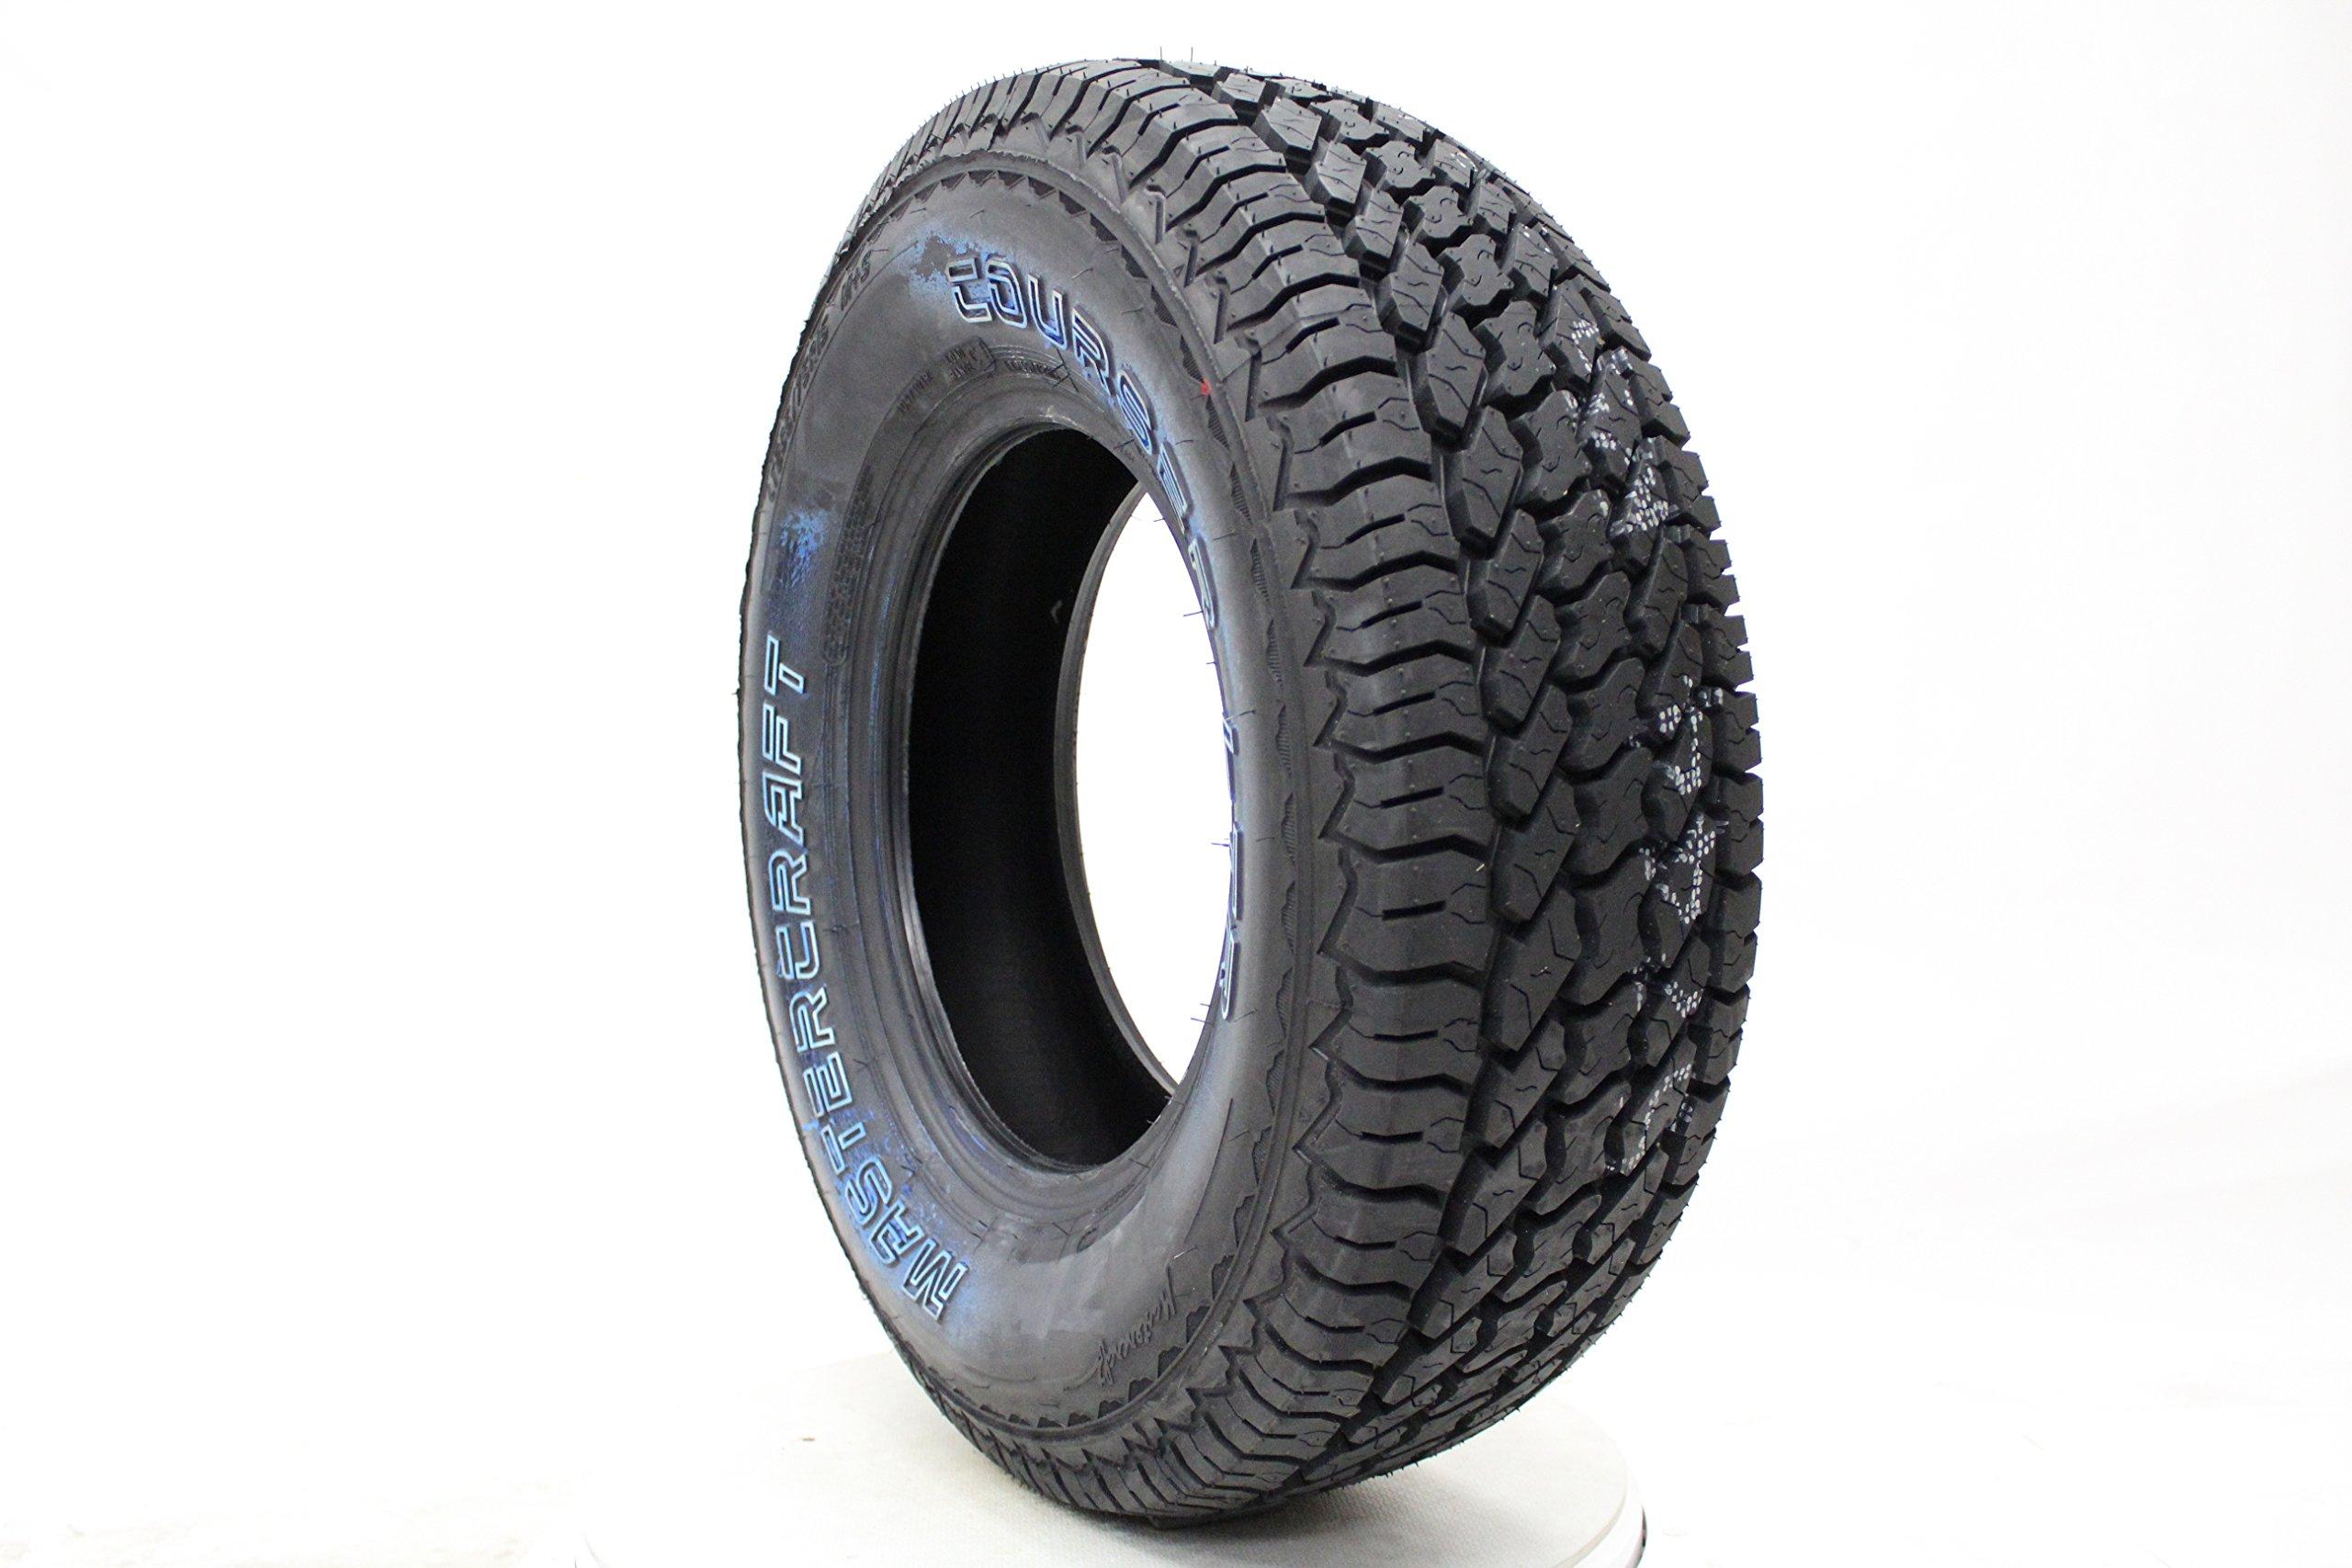 Mastercraft Courser LTR All-Season Radial Tire - 245/70R17 119S